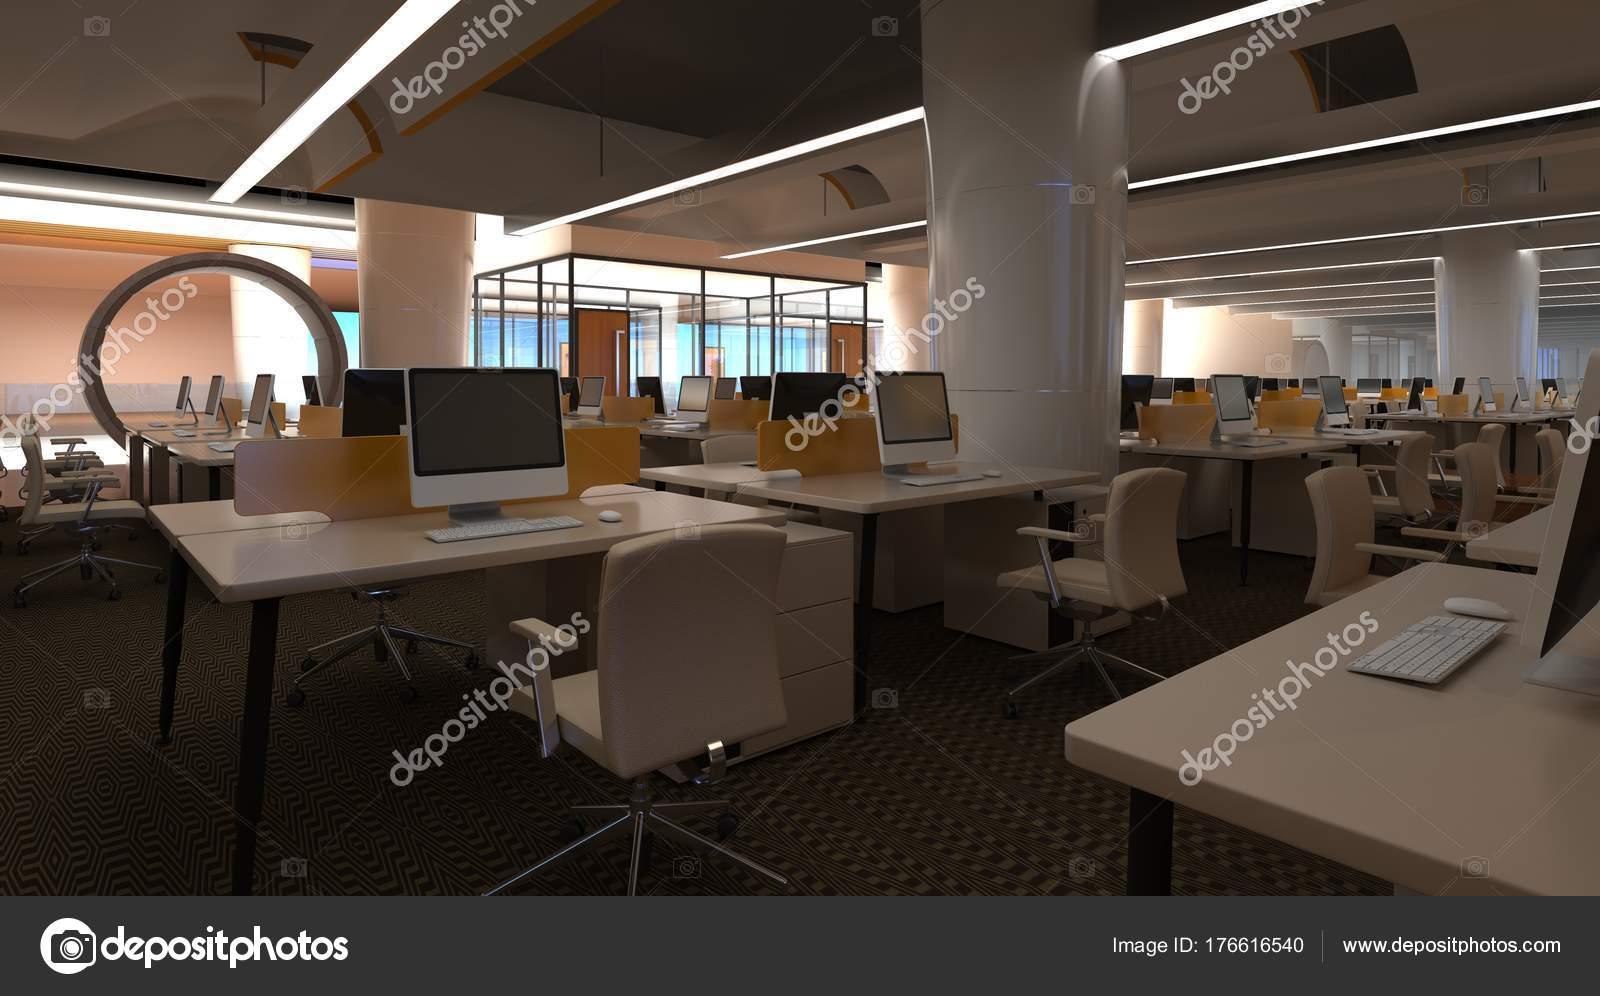 Dise o interior oficinas modernas ilustraci n 3d el for Oficinas enterprise